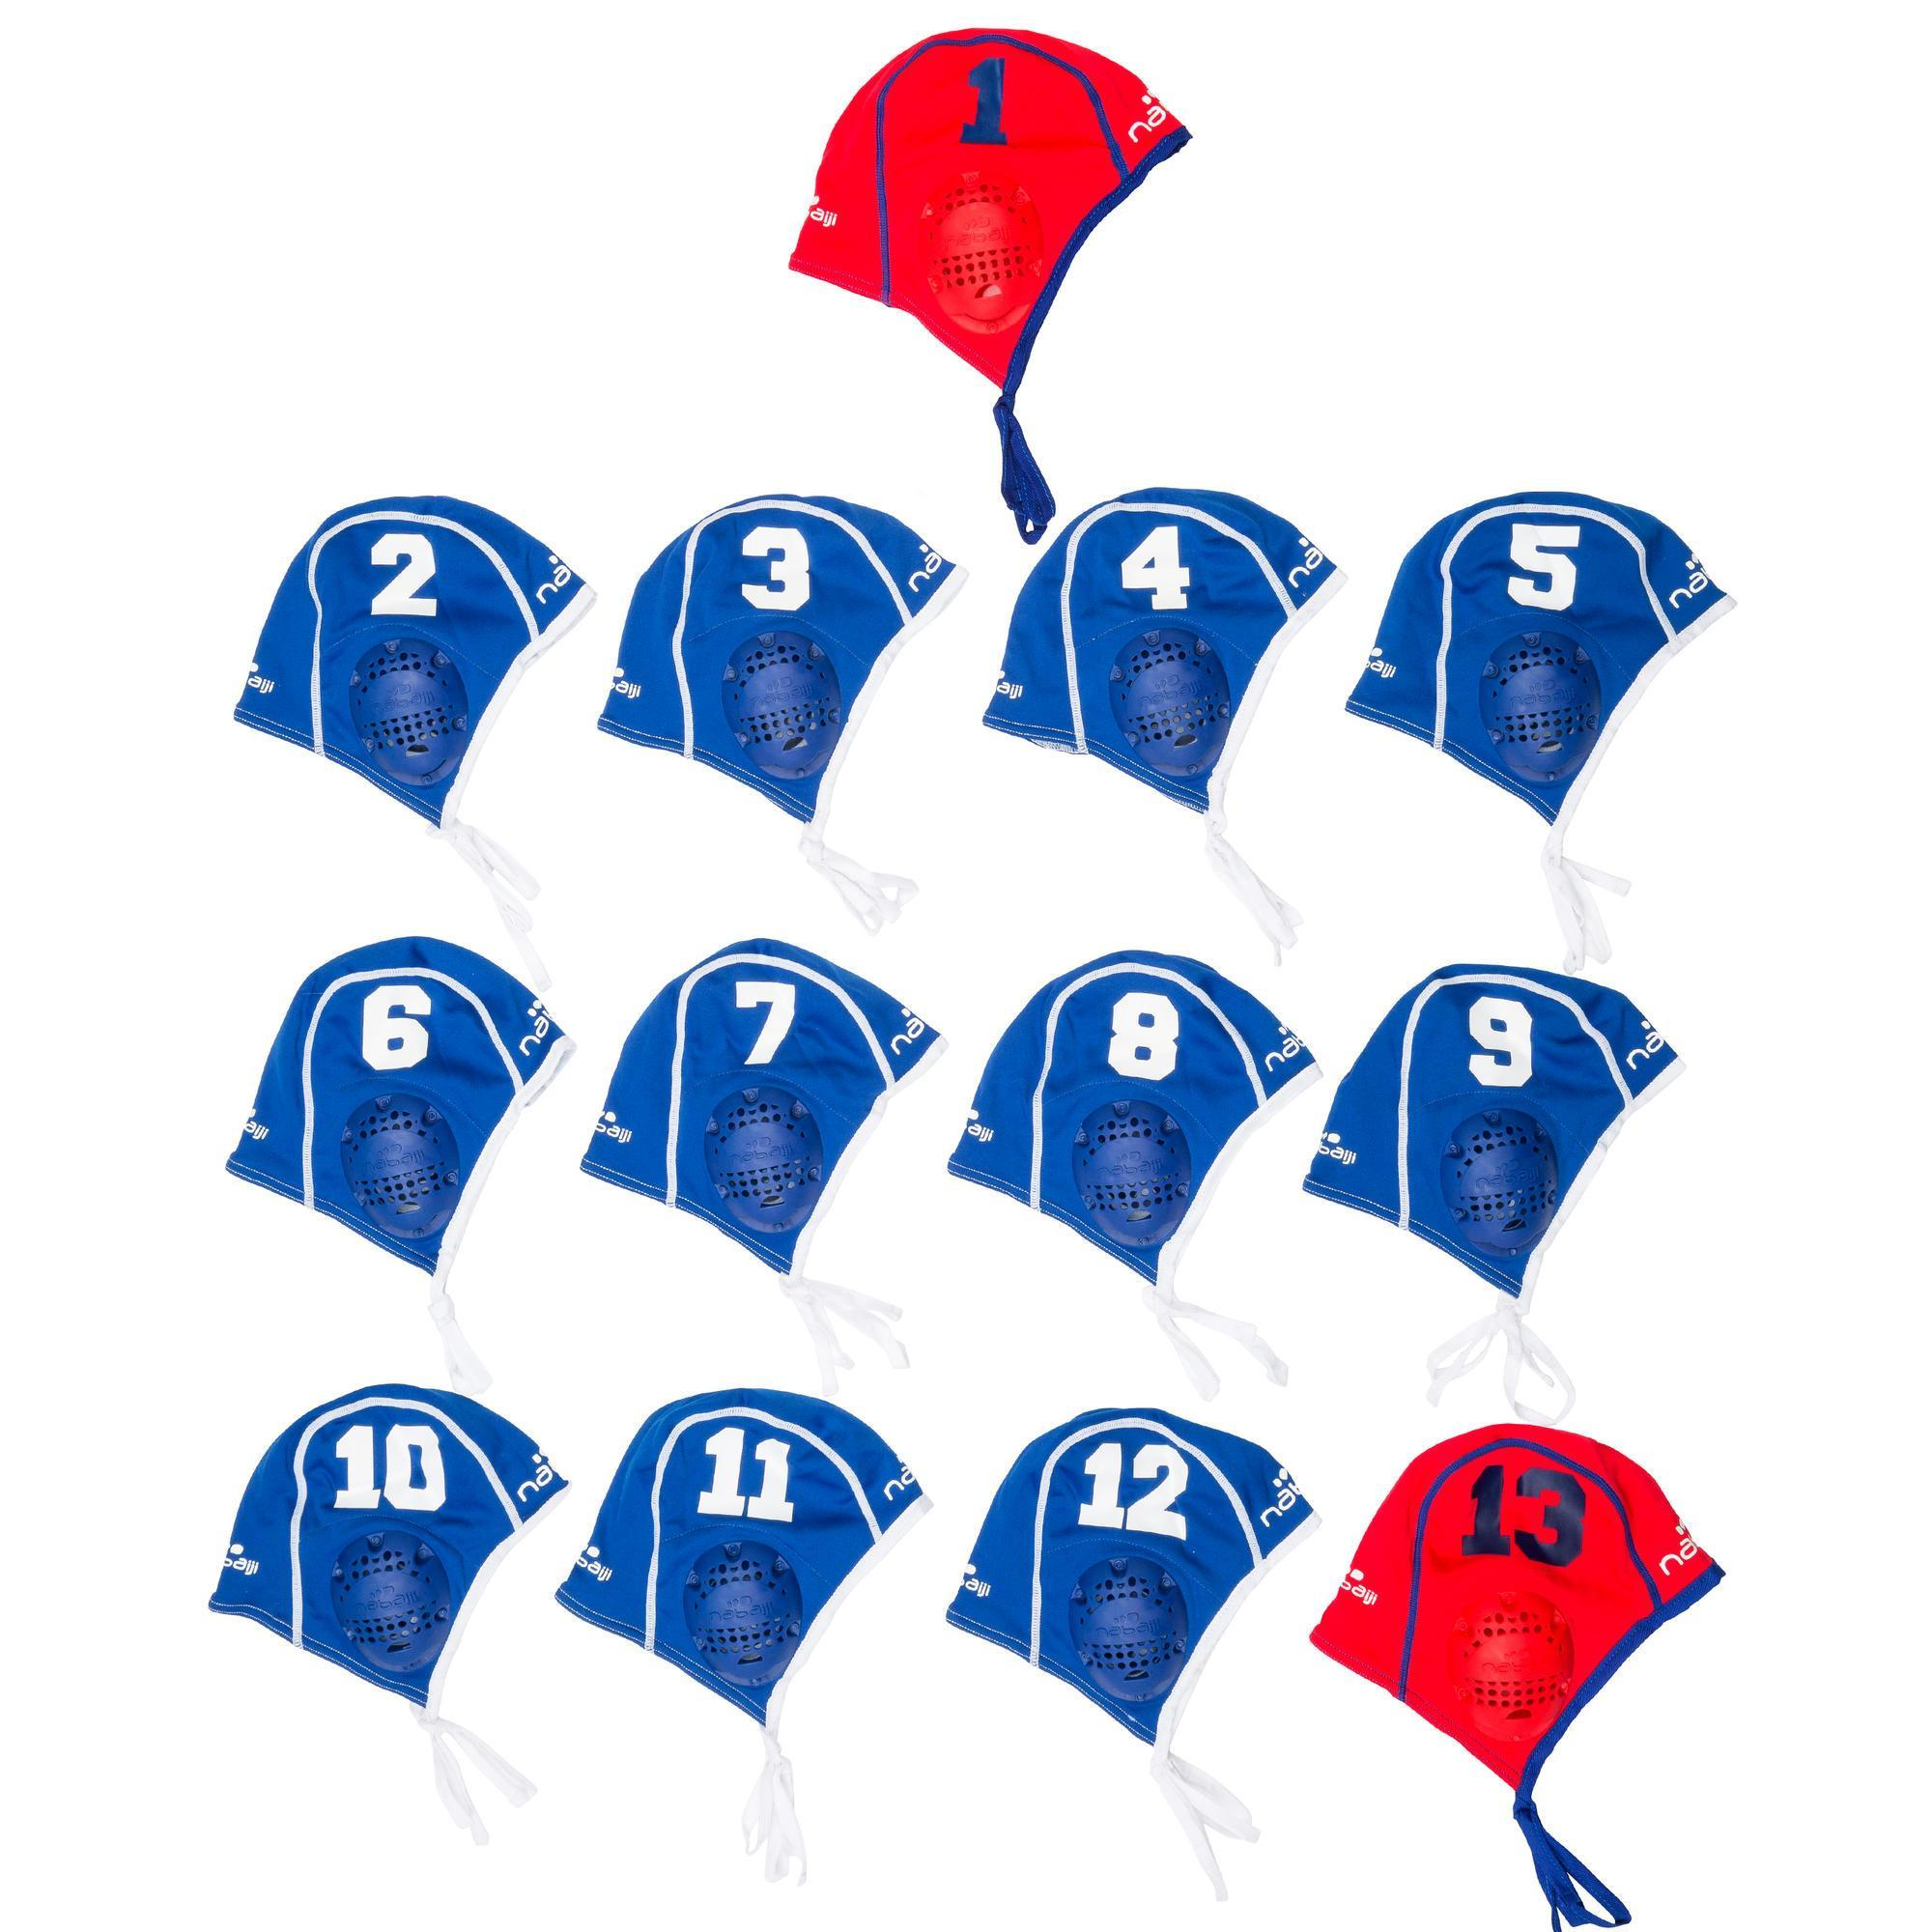 Damen,Herren Wasserball-Kappen 13St. Erwachsene blau | 03583788489375